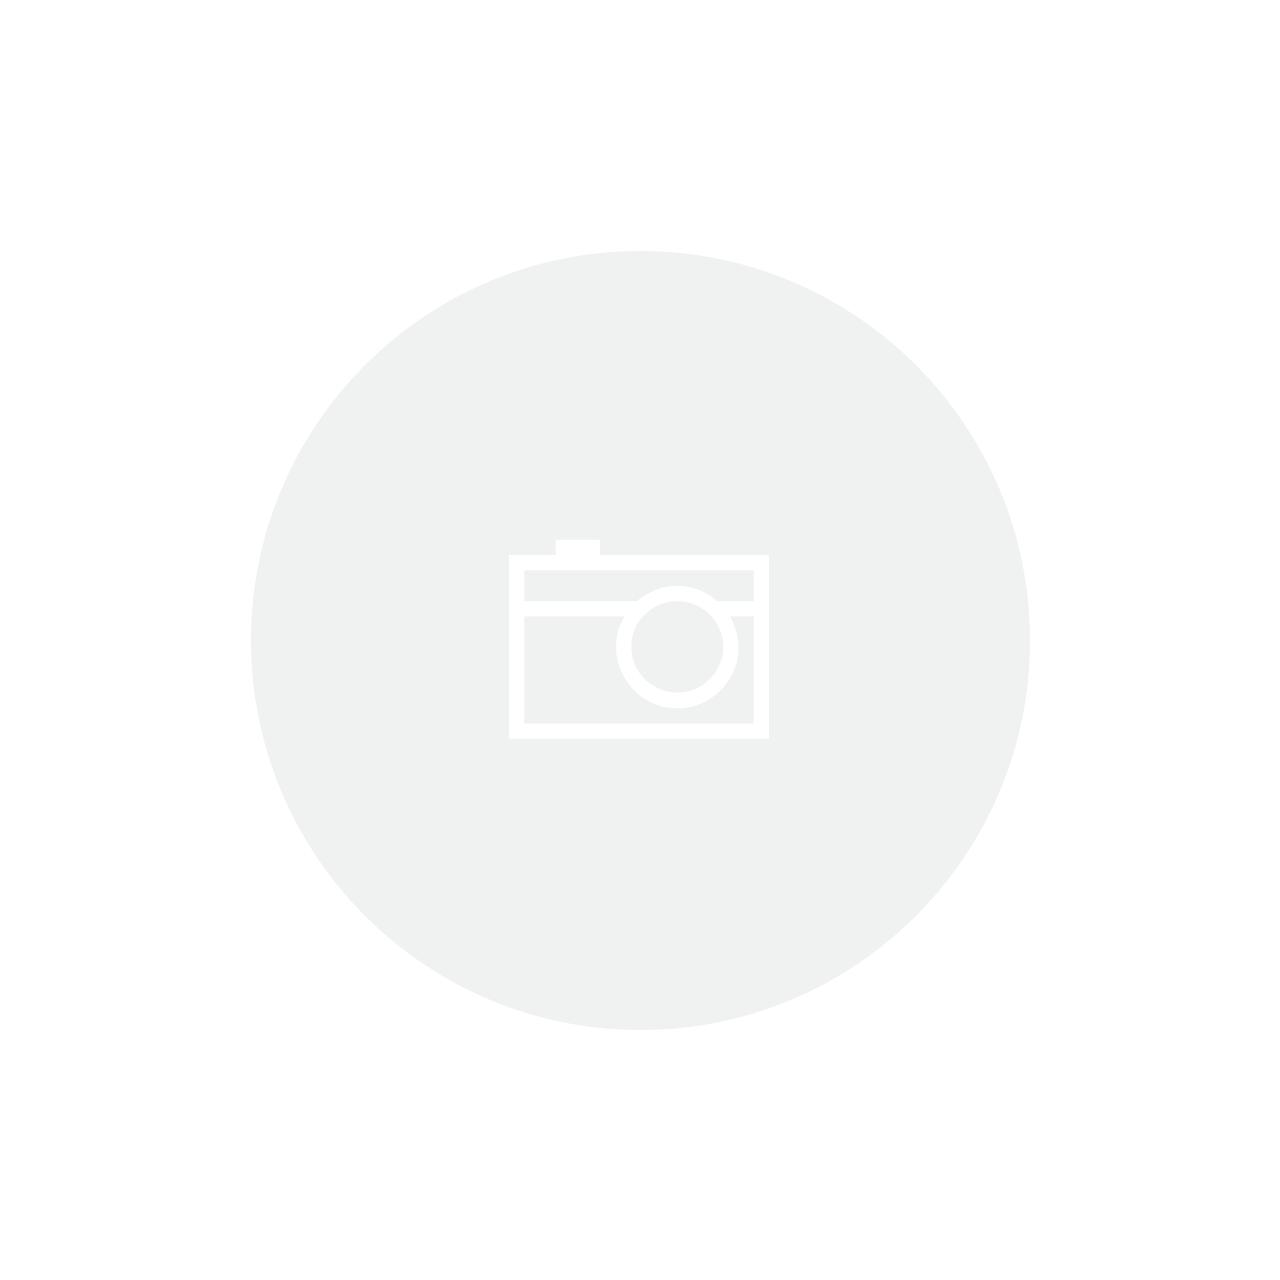 Básica Tricô Viscose Decote Redondo | Bv812